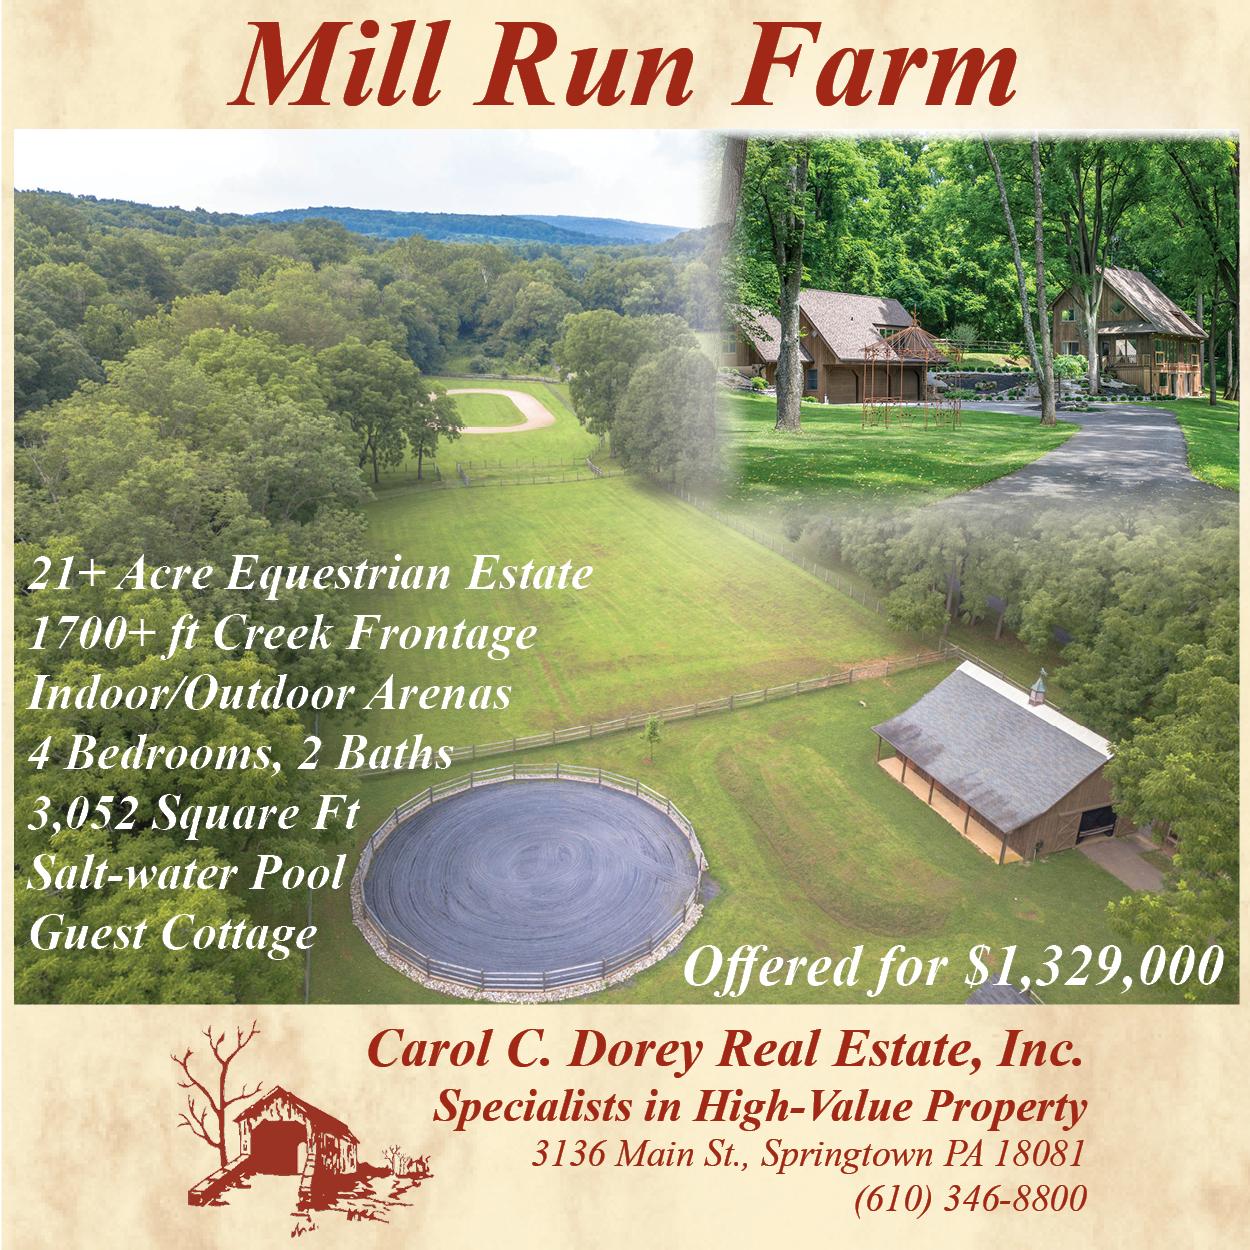 Mill Run Farm - Dorey